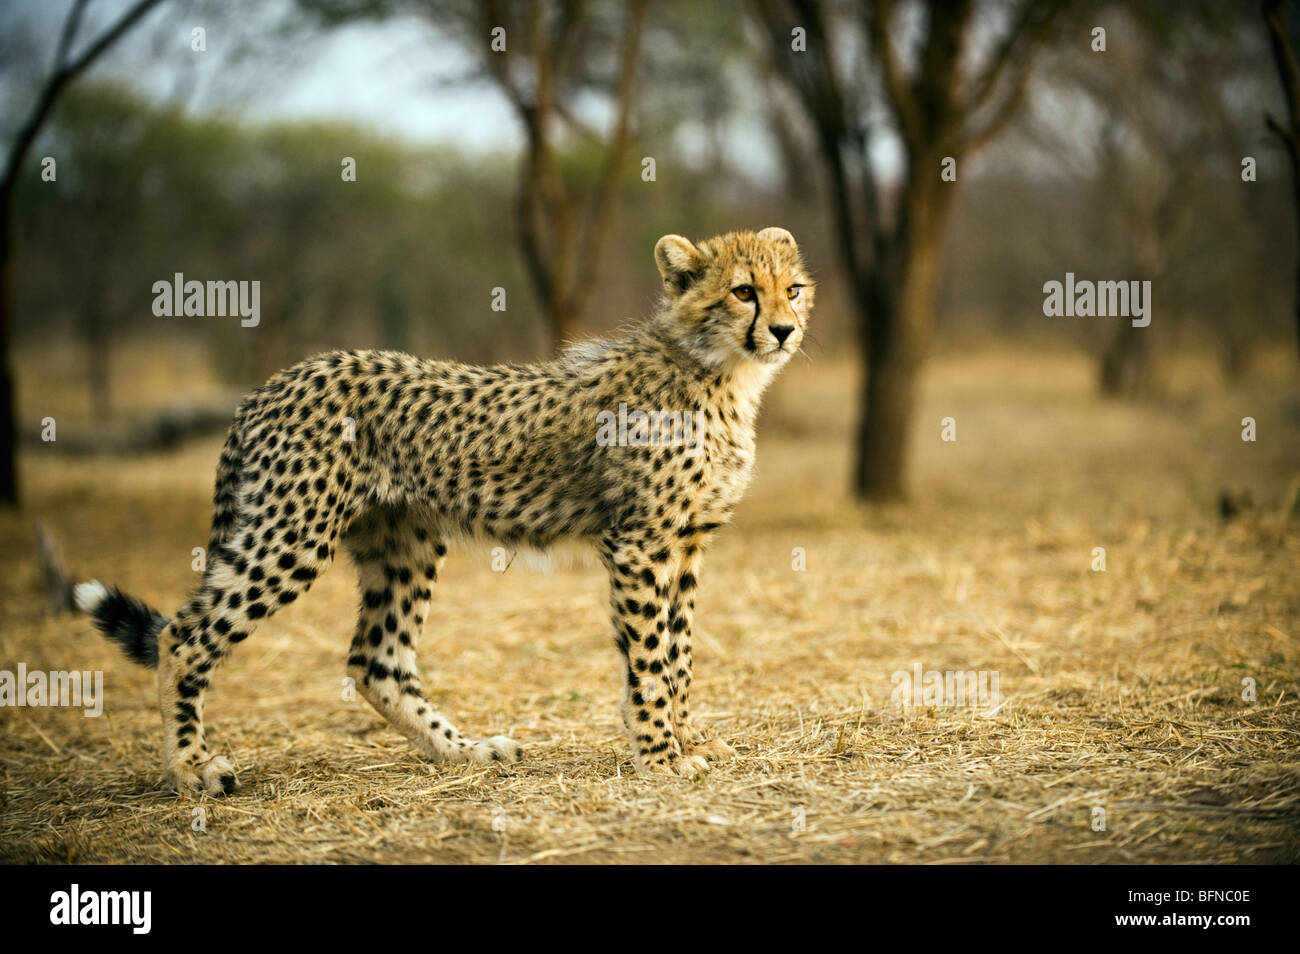 Cheetah Cub Portrait - Stock Image